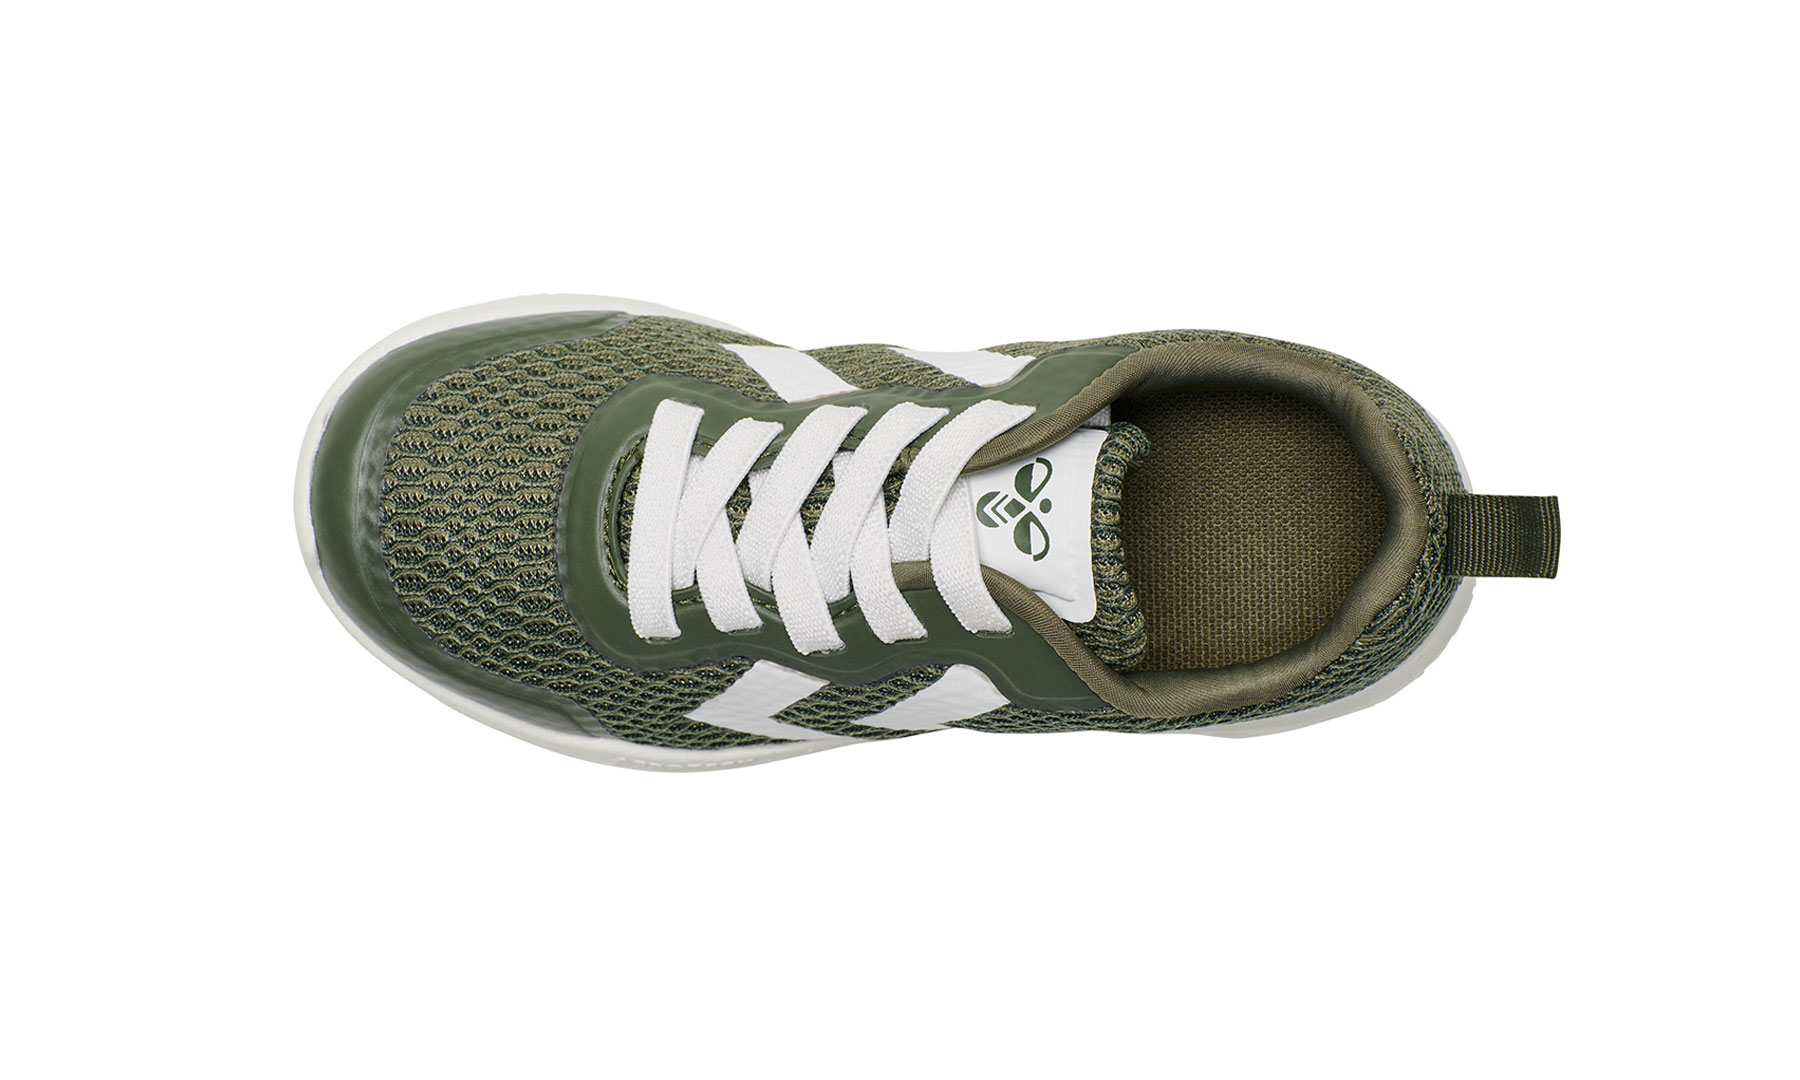 Hummel Actus joggesko til barn, grønne DressMyKid AS